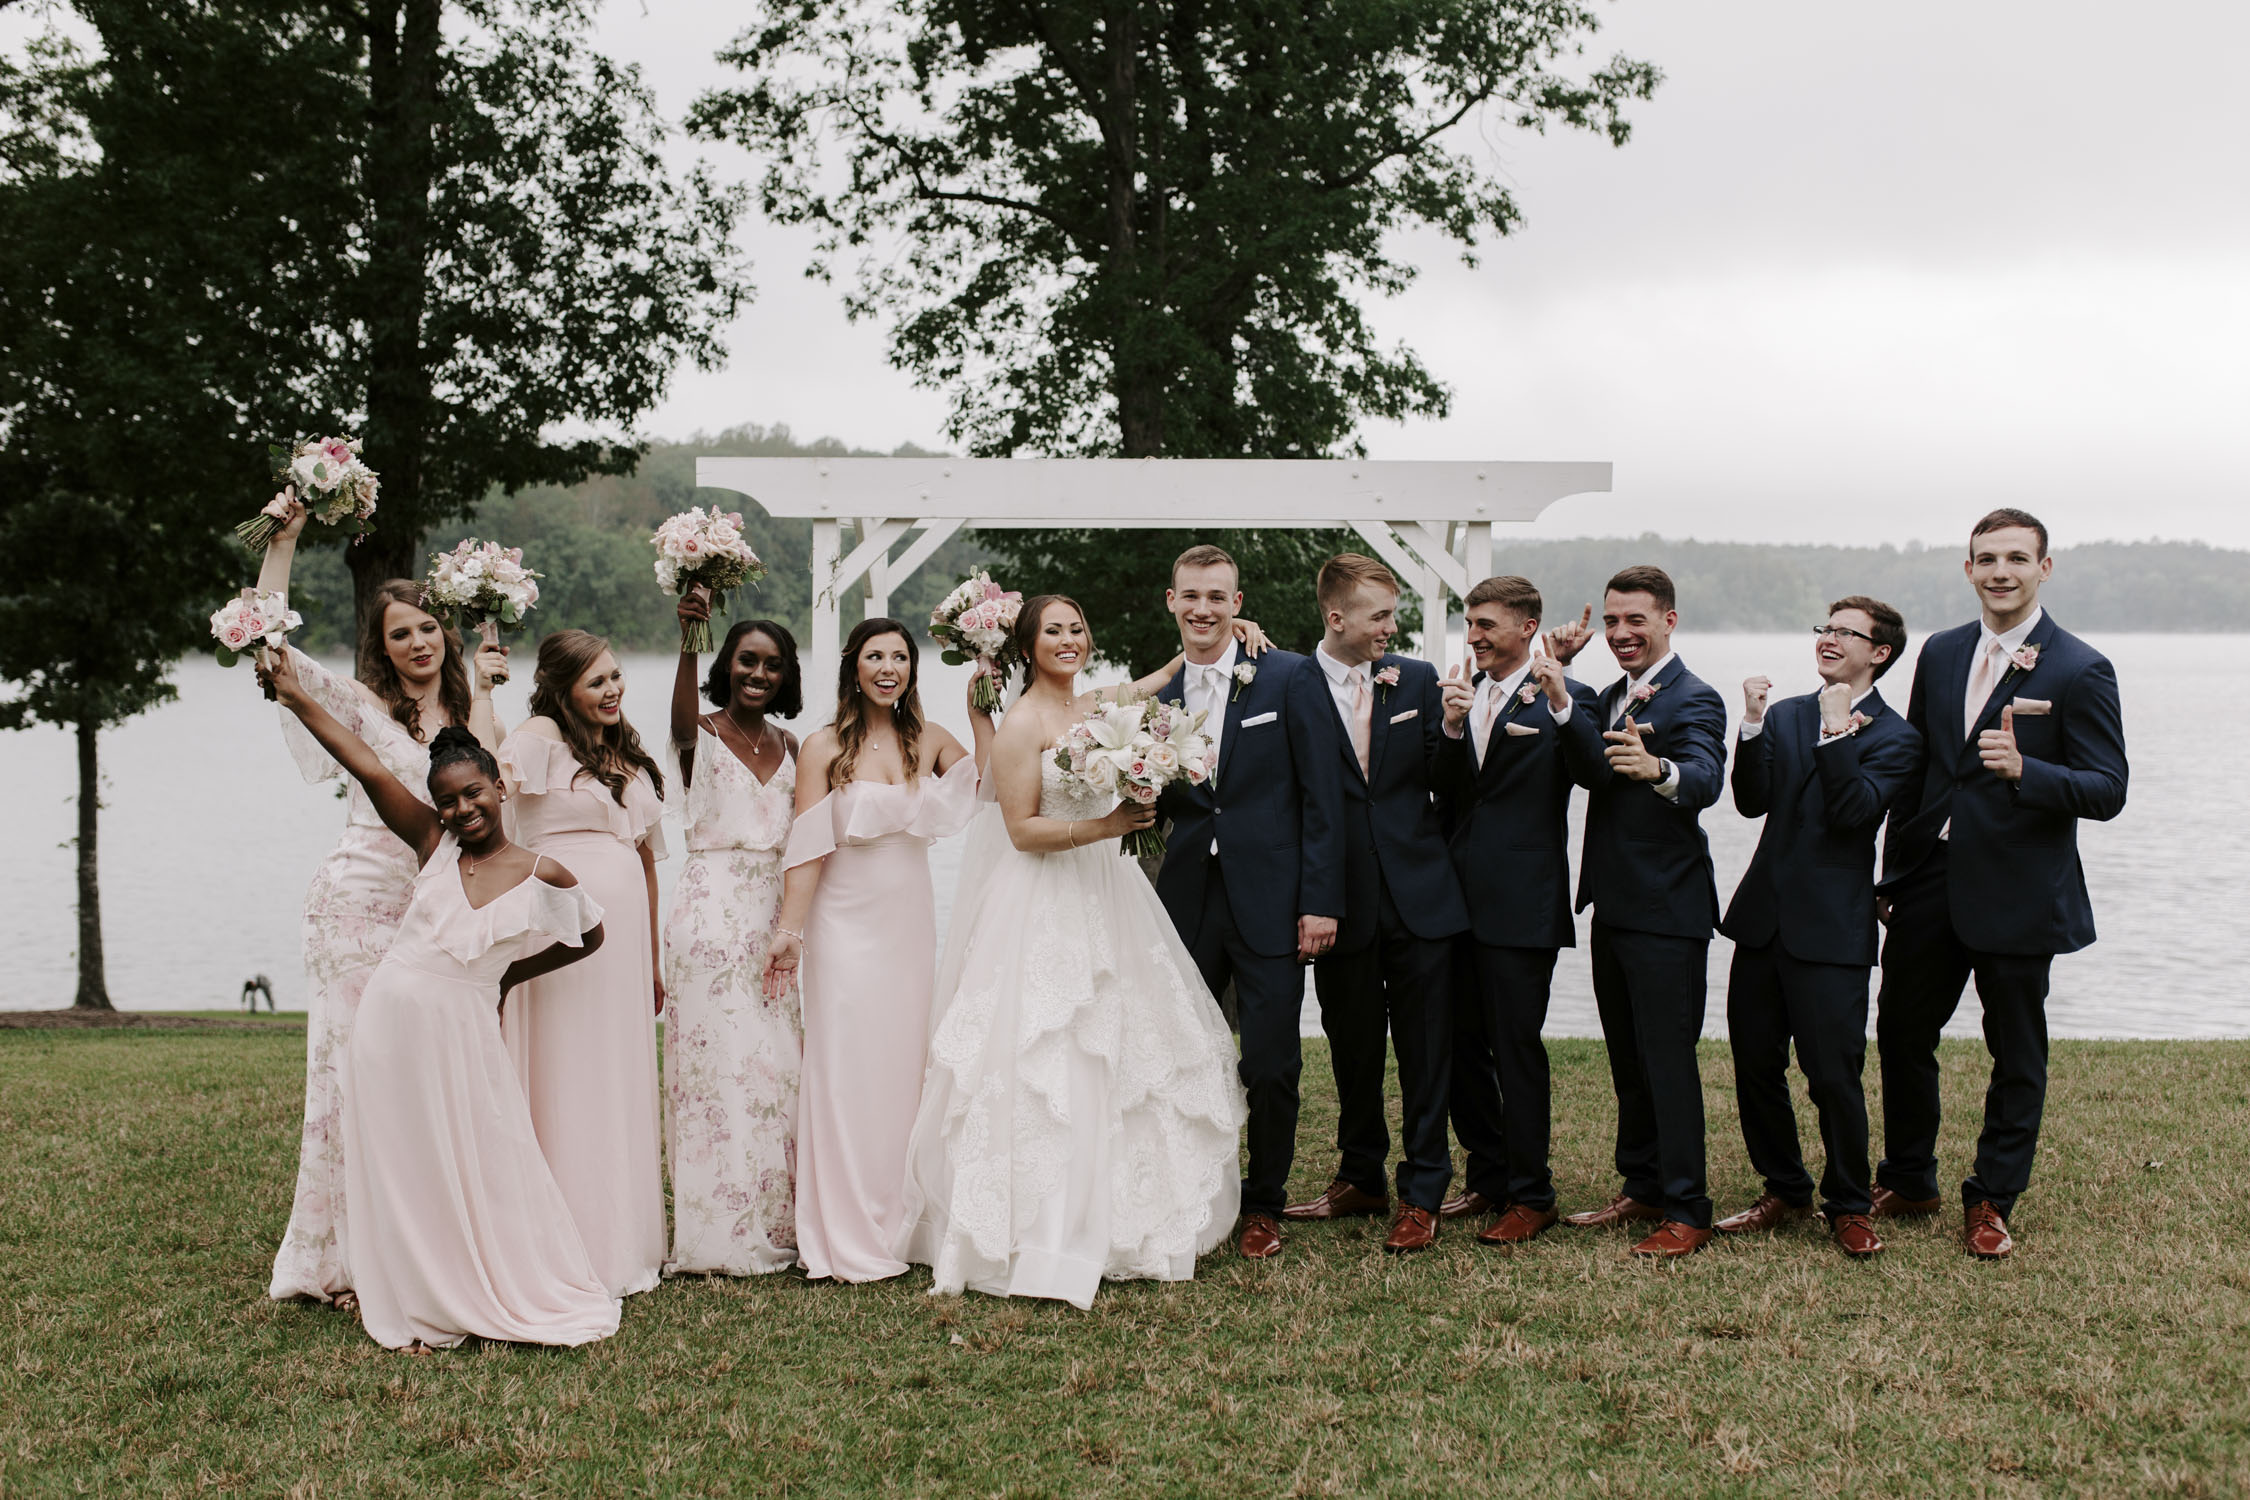 Rainy Bella Collina Wedding - Full Wedding Party Portraits| Kayli LaFon Photography, Greensboro Winston-Salem NC Wedding Photographer